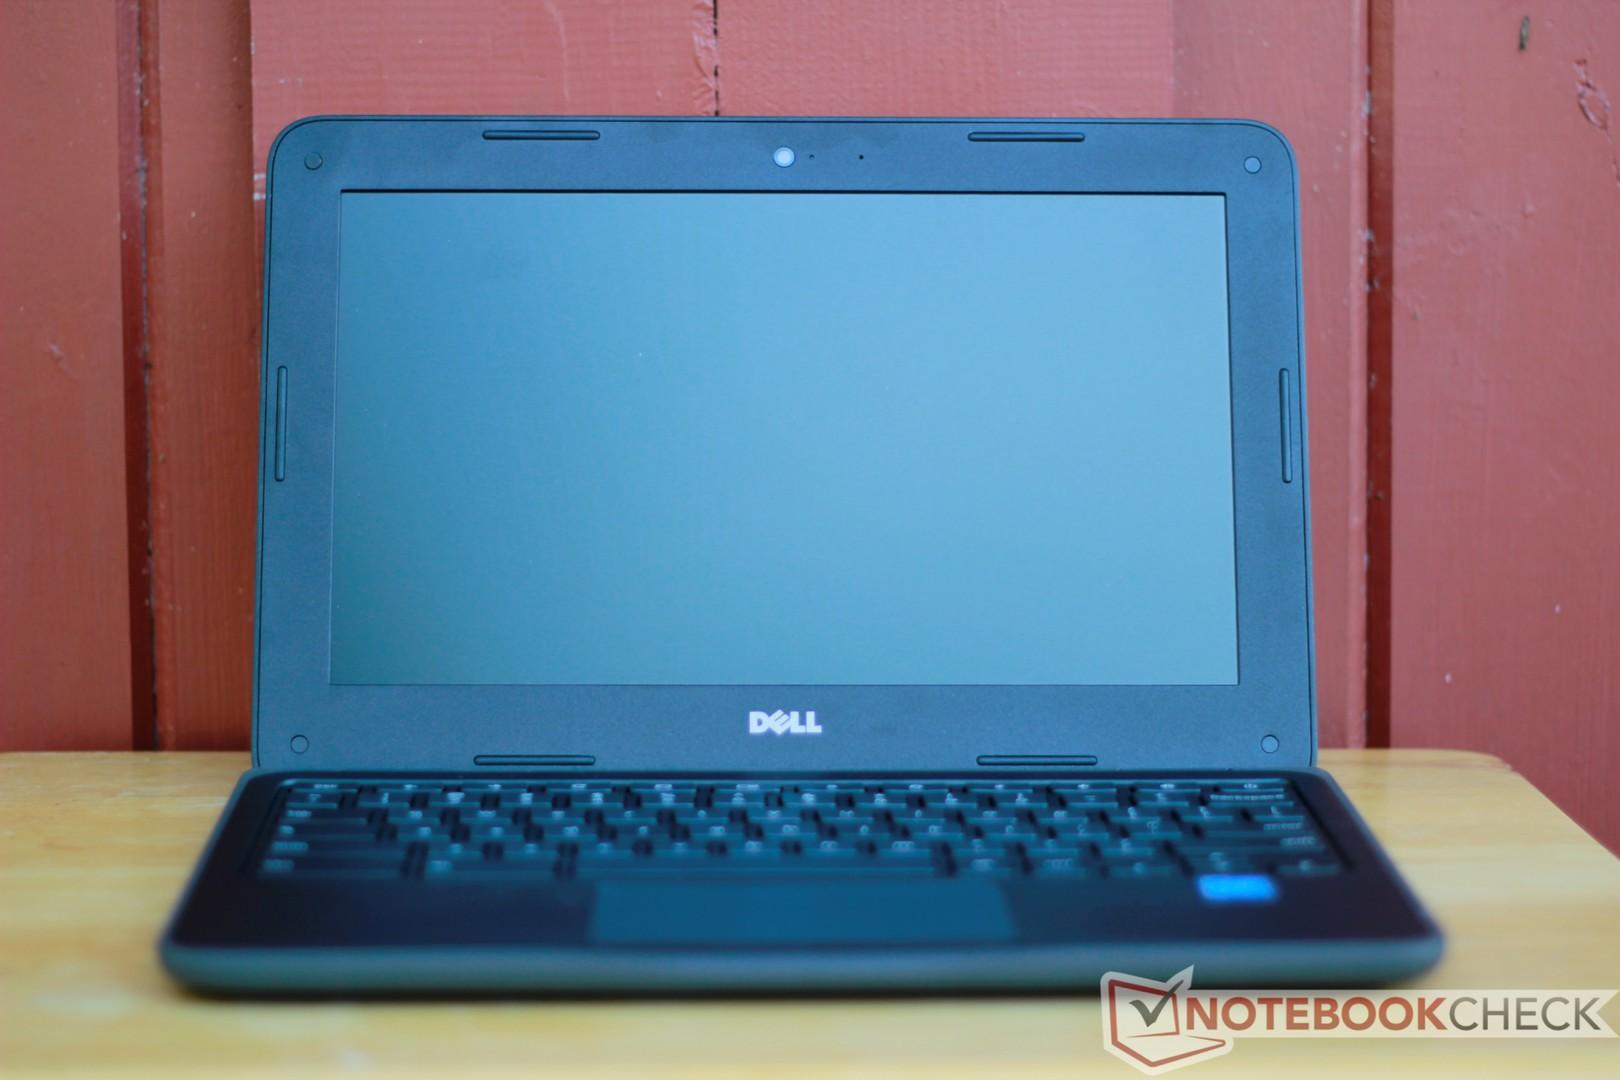 Dell Chromebook 11 3181 Celeron N3060 Laptop Review